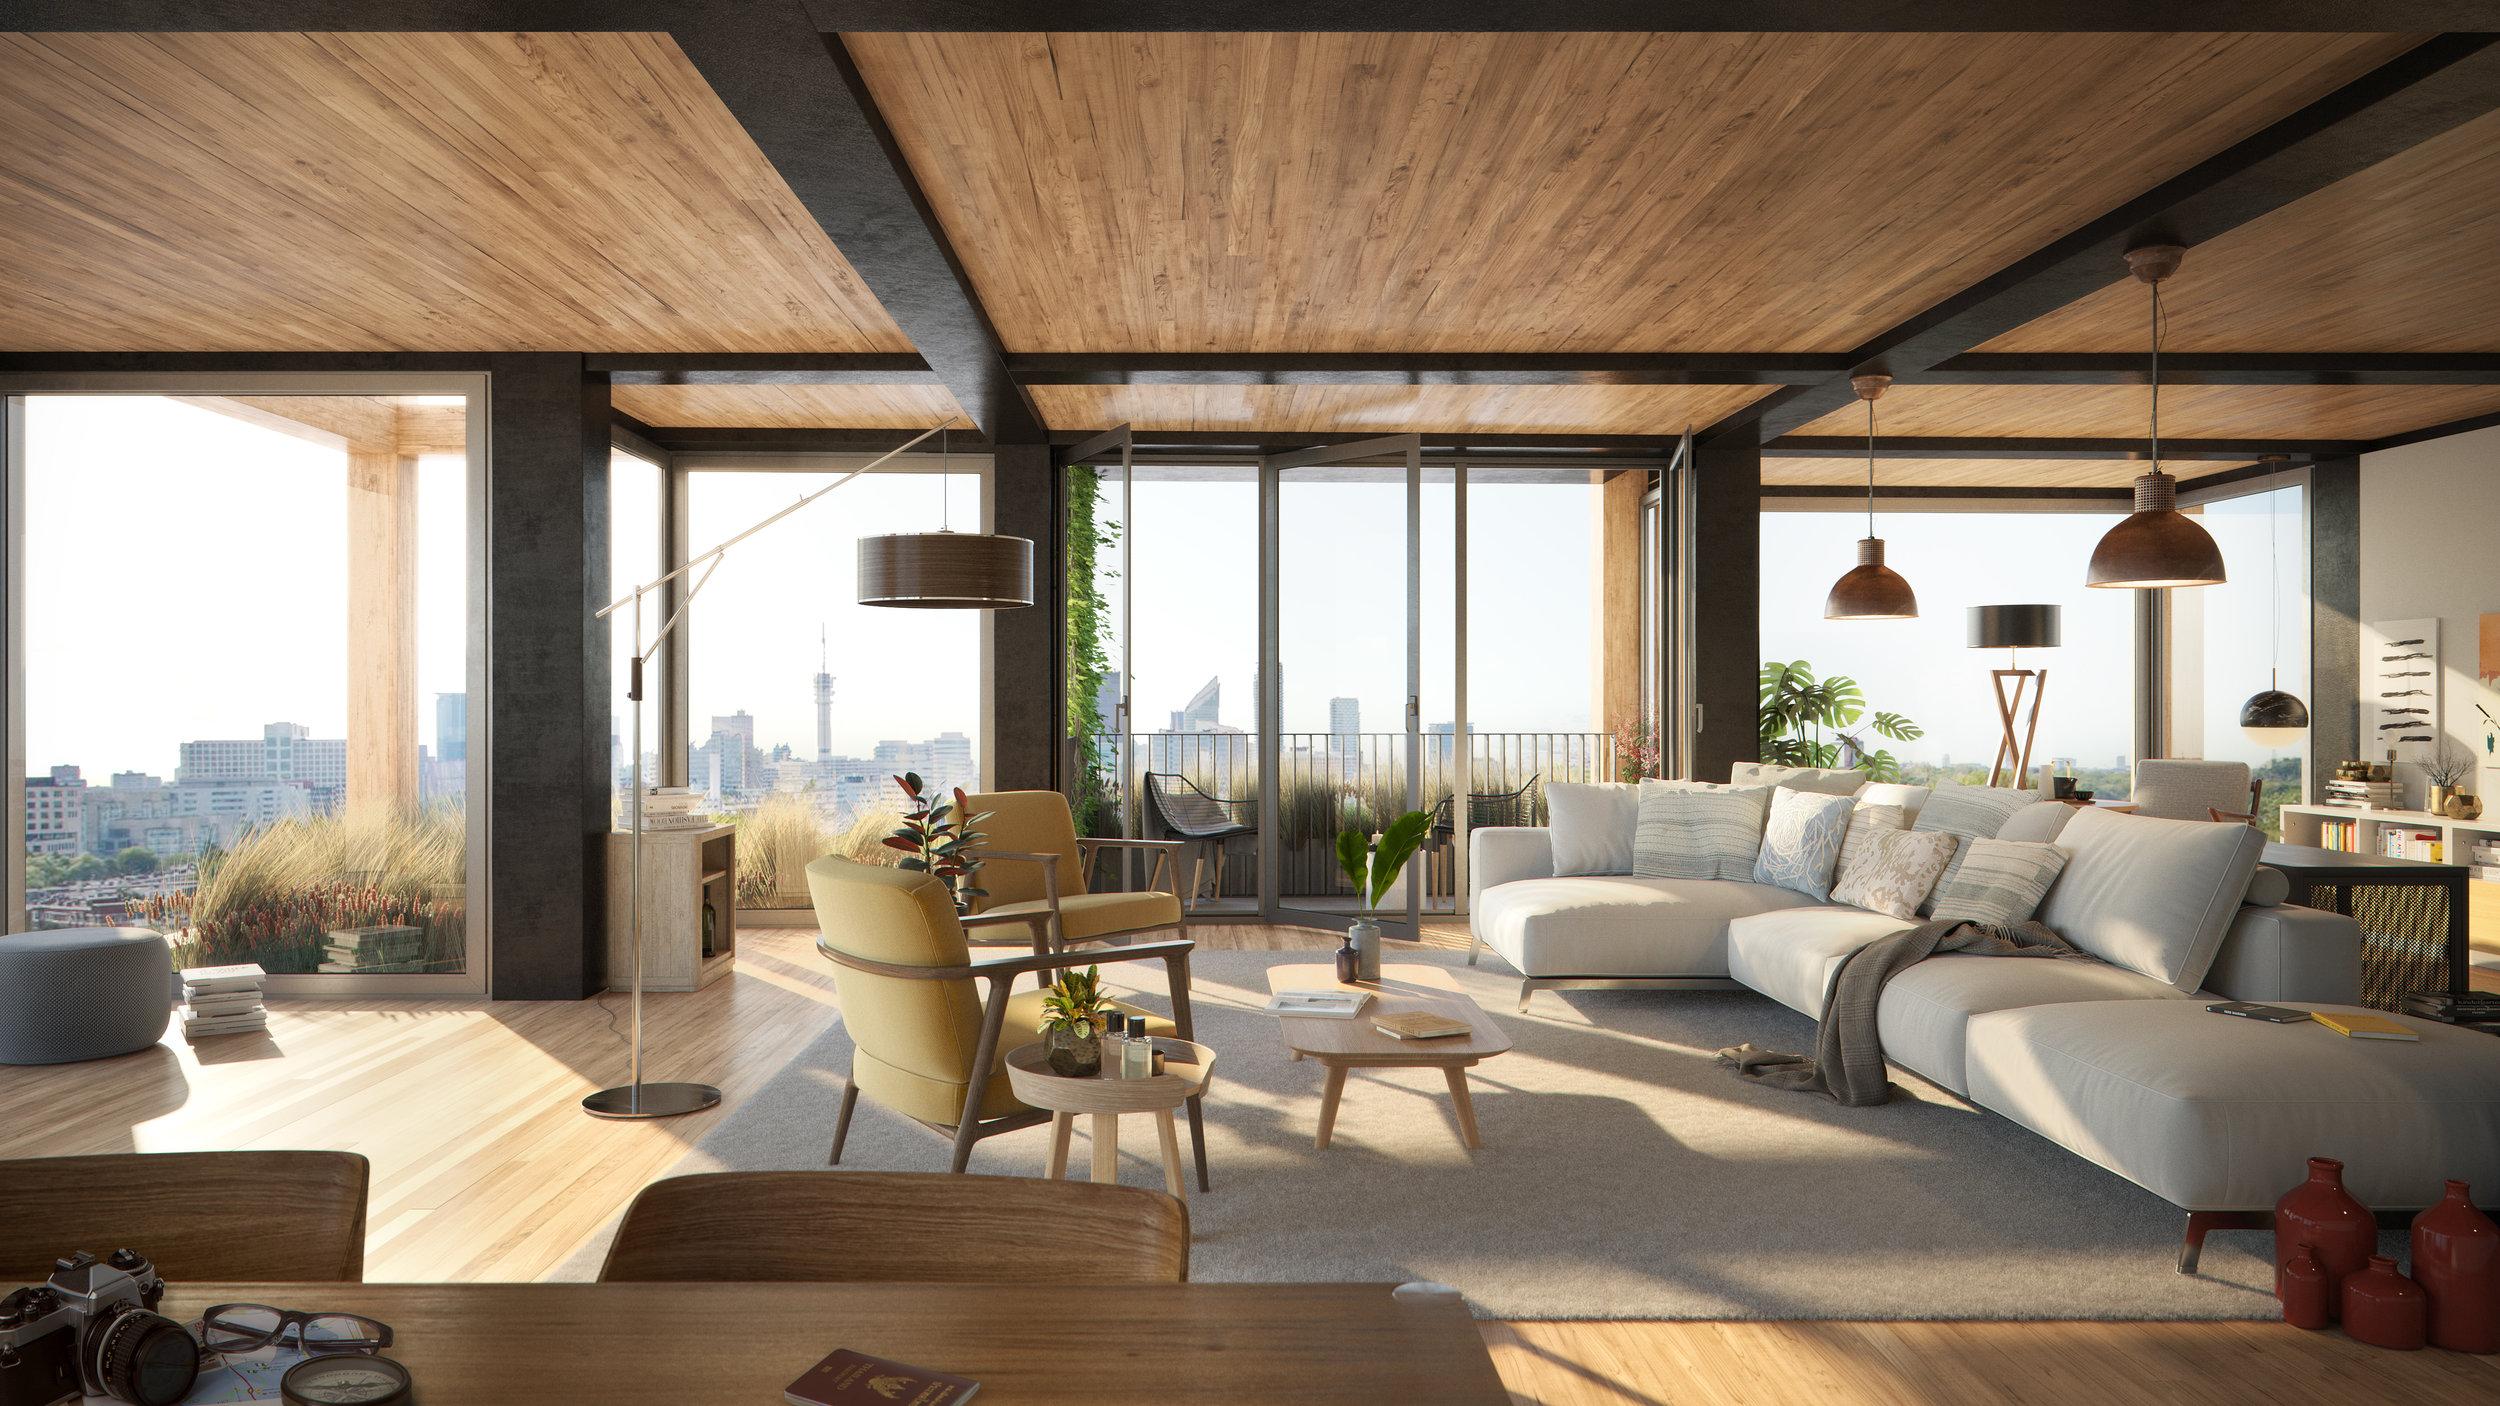 OlafGipserArchitects - Trekvliet 1C - Penthouse - CopyrightPlompmozes.jpg